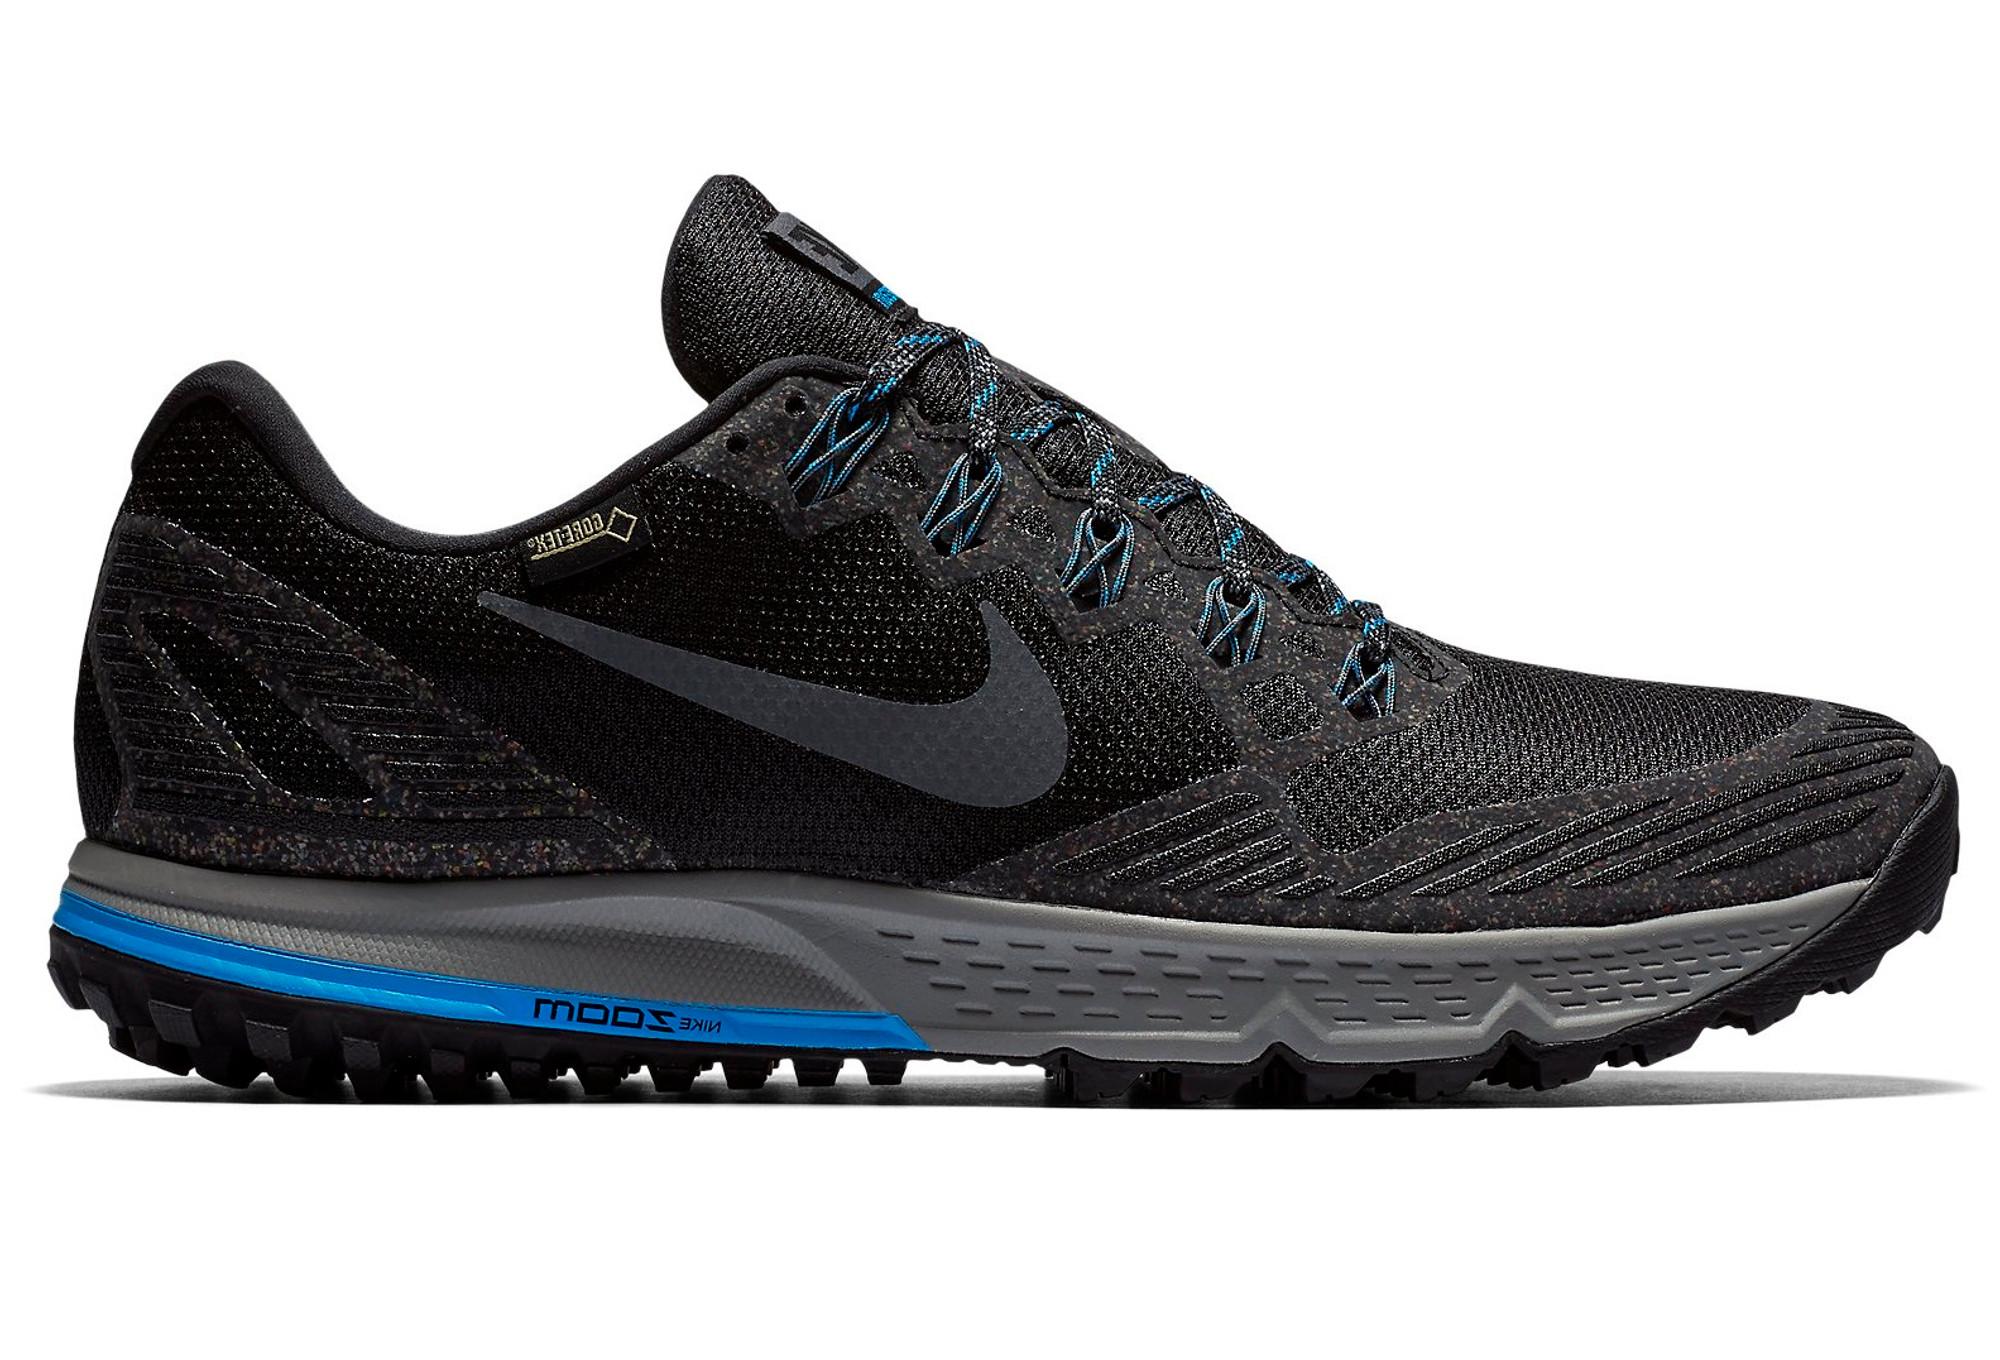 1574ed2bf20f8 NIKE Shoes AIR ZOOM WILDHORSE 3 GTX Black Grey Blue